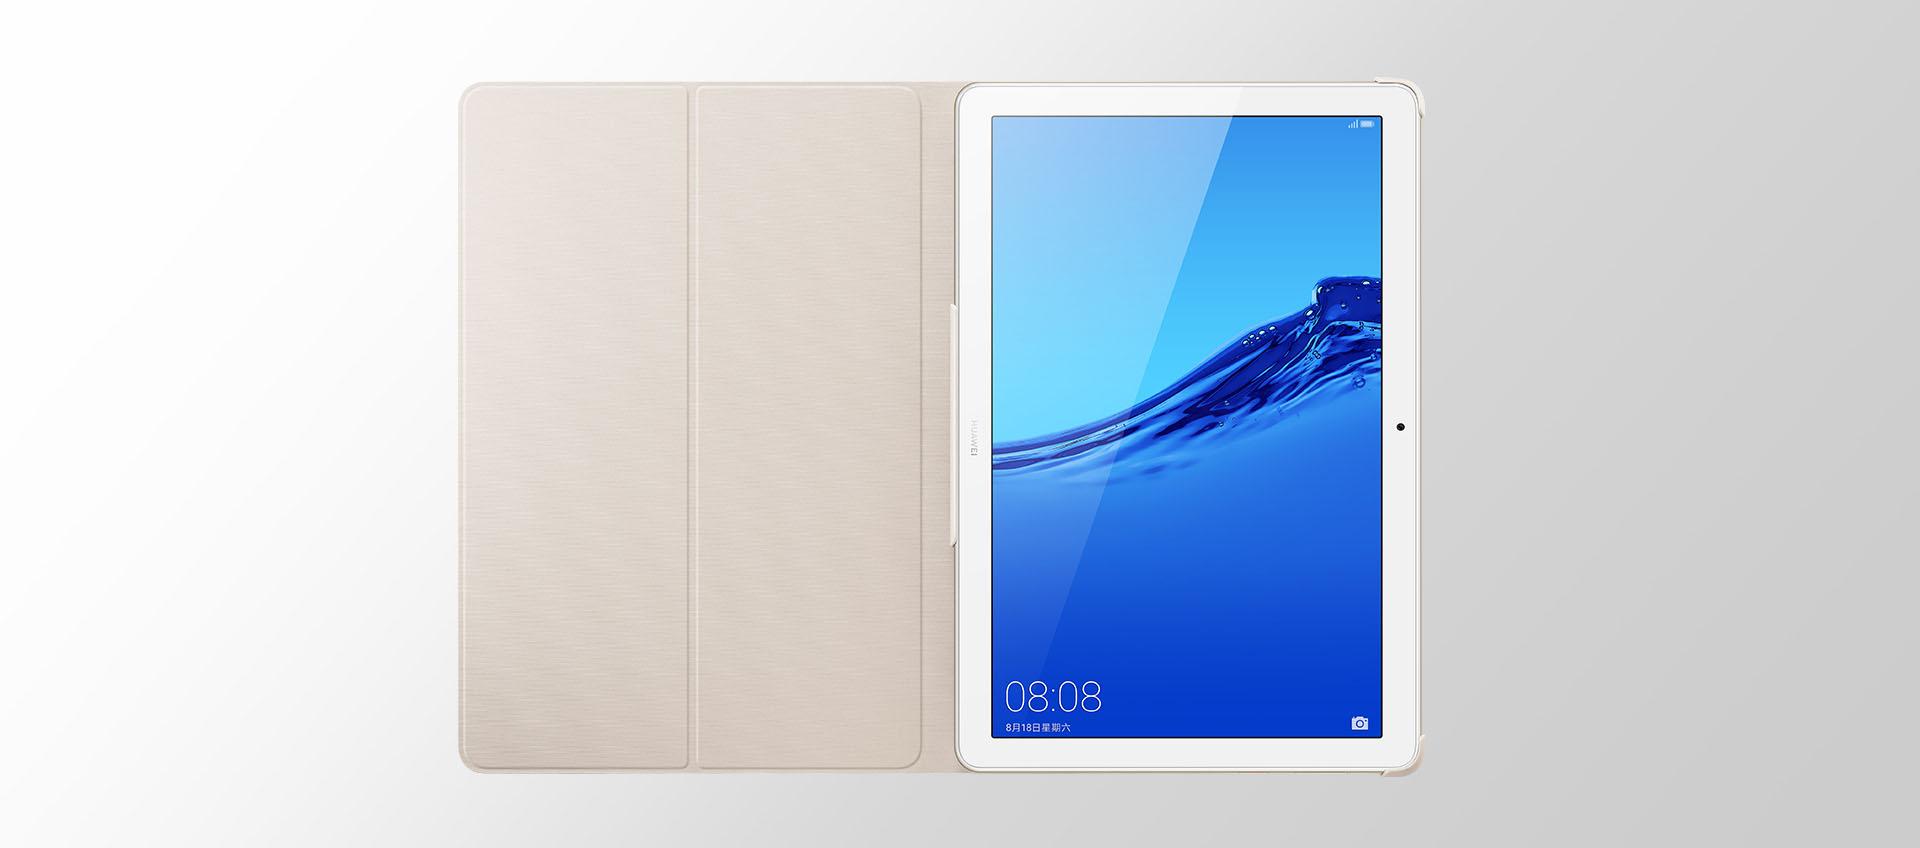 Huawei Enjoy MediaPad case